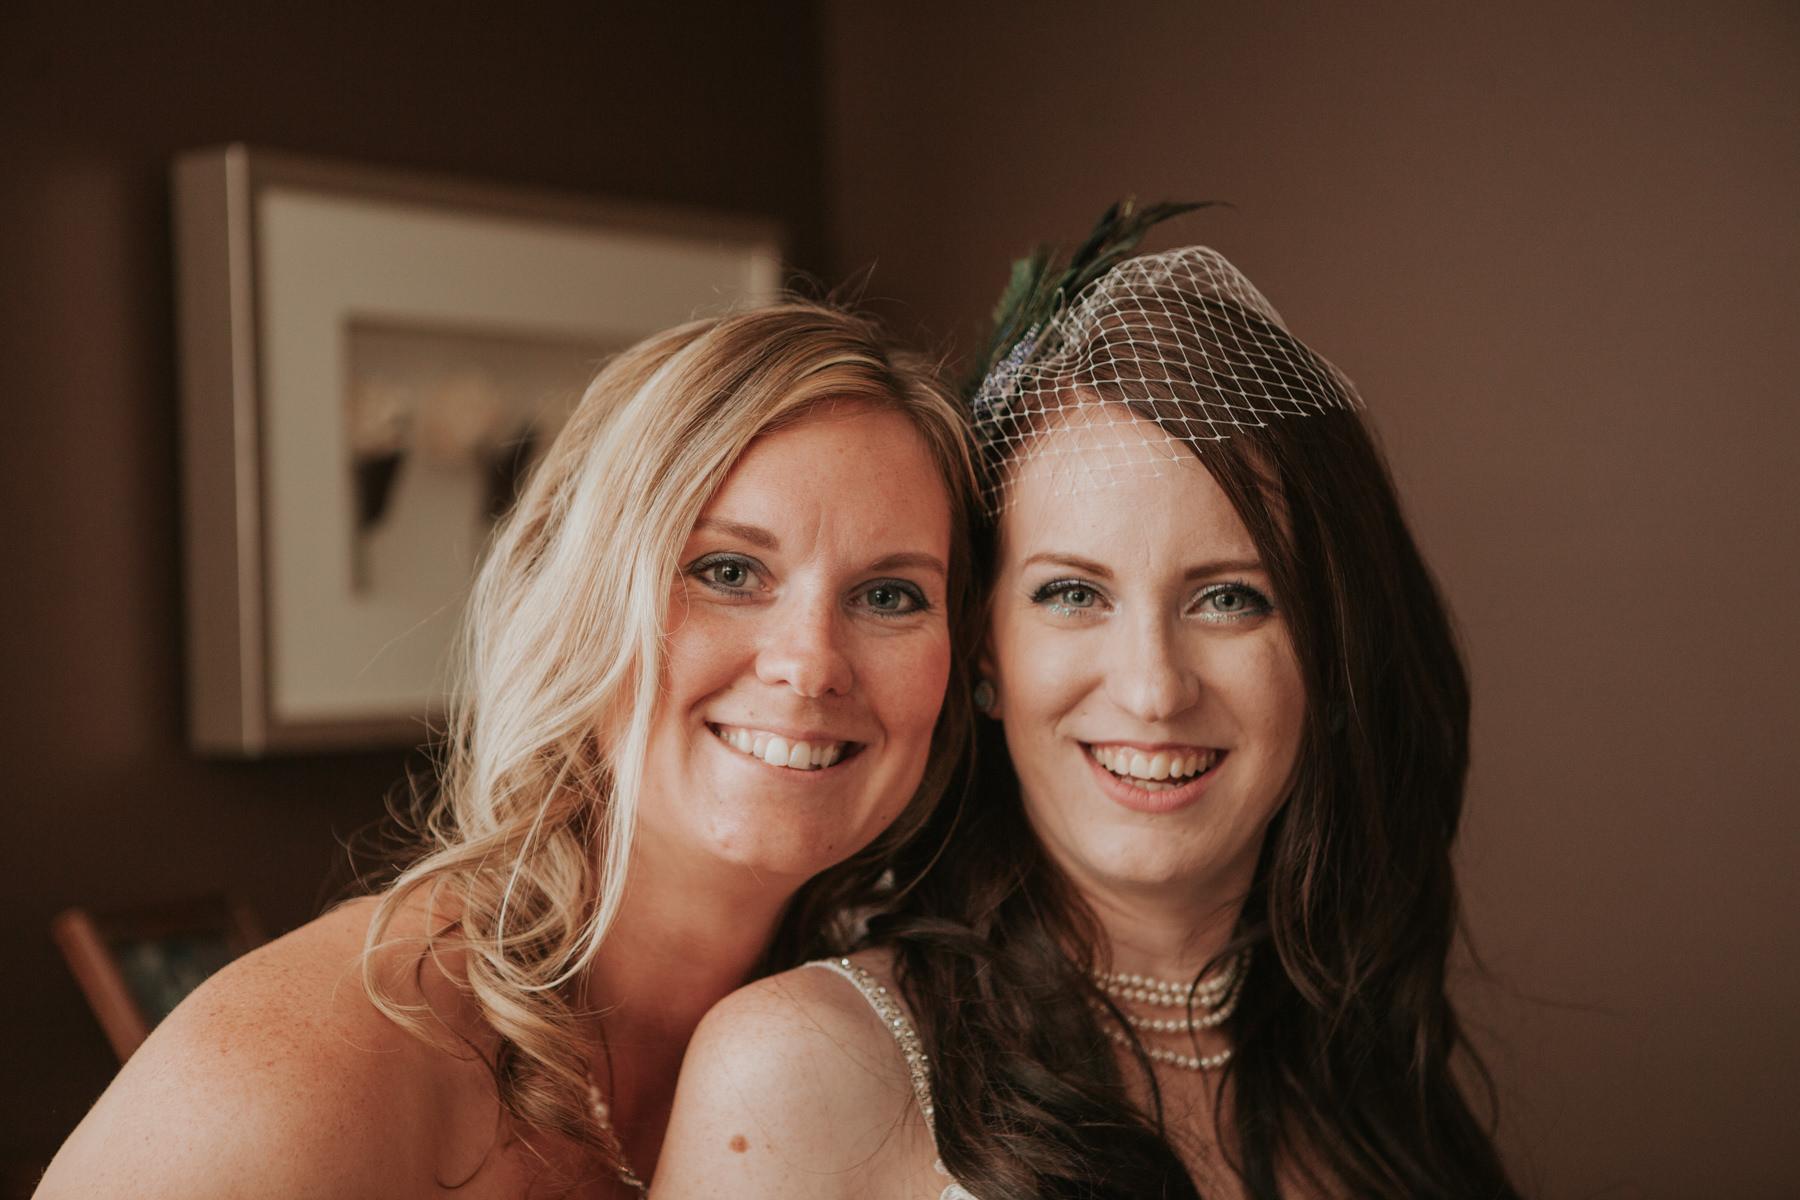 Vancouver wedding photographer - Pam 7